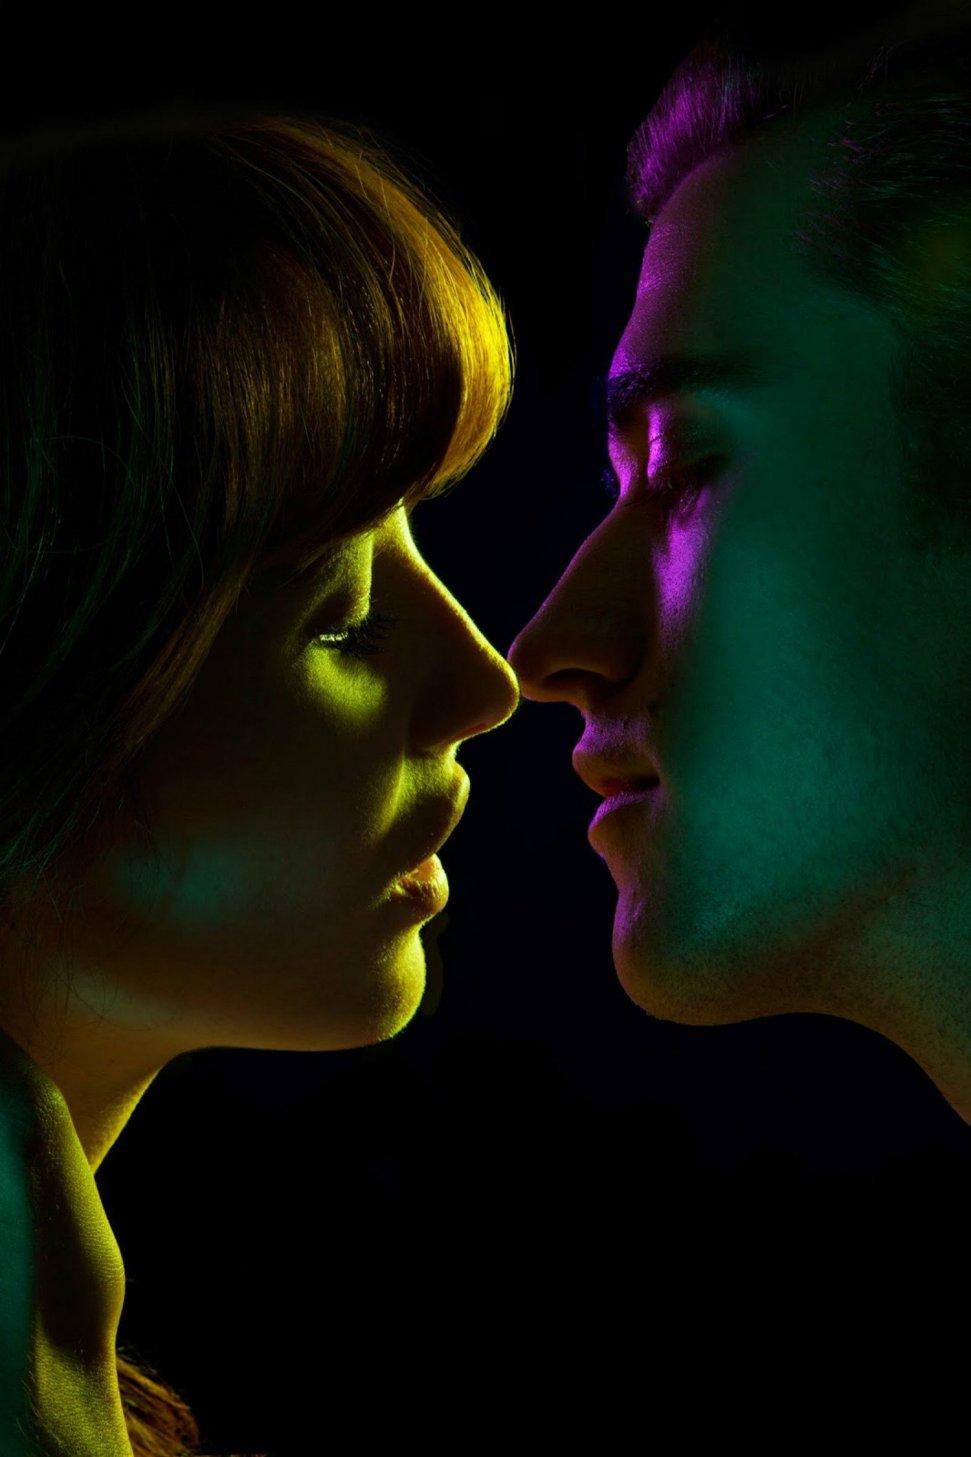 Таинственная красота поцелуя